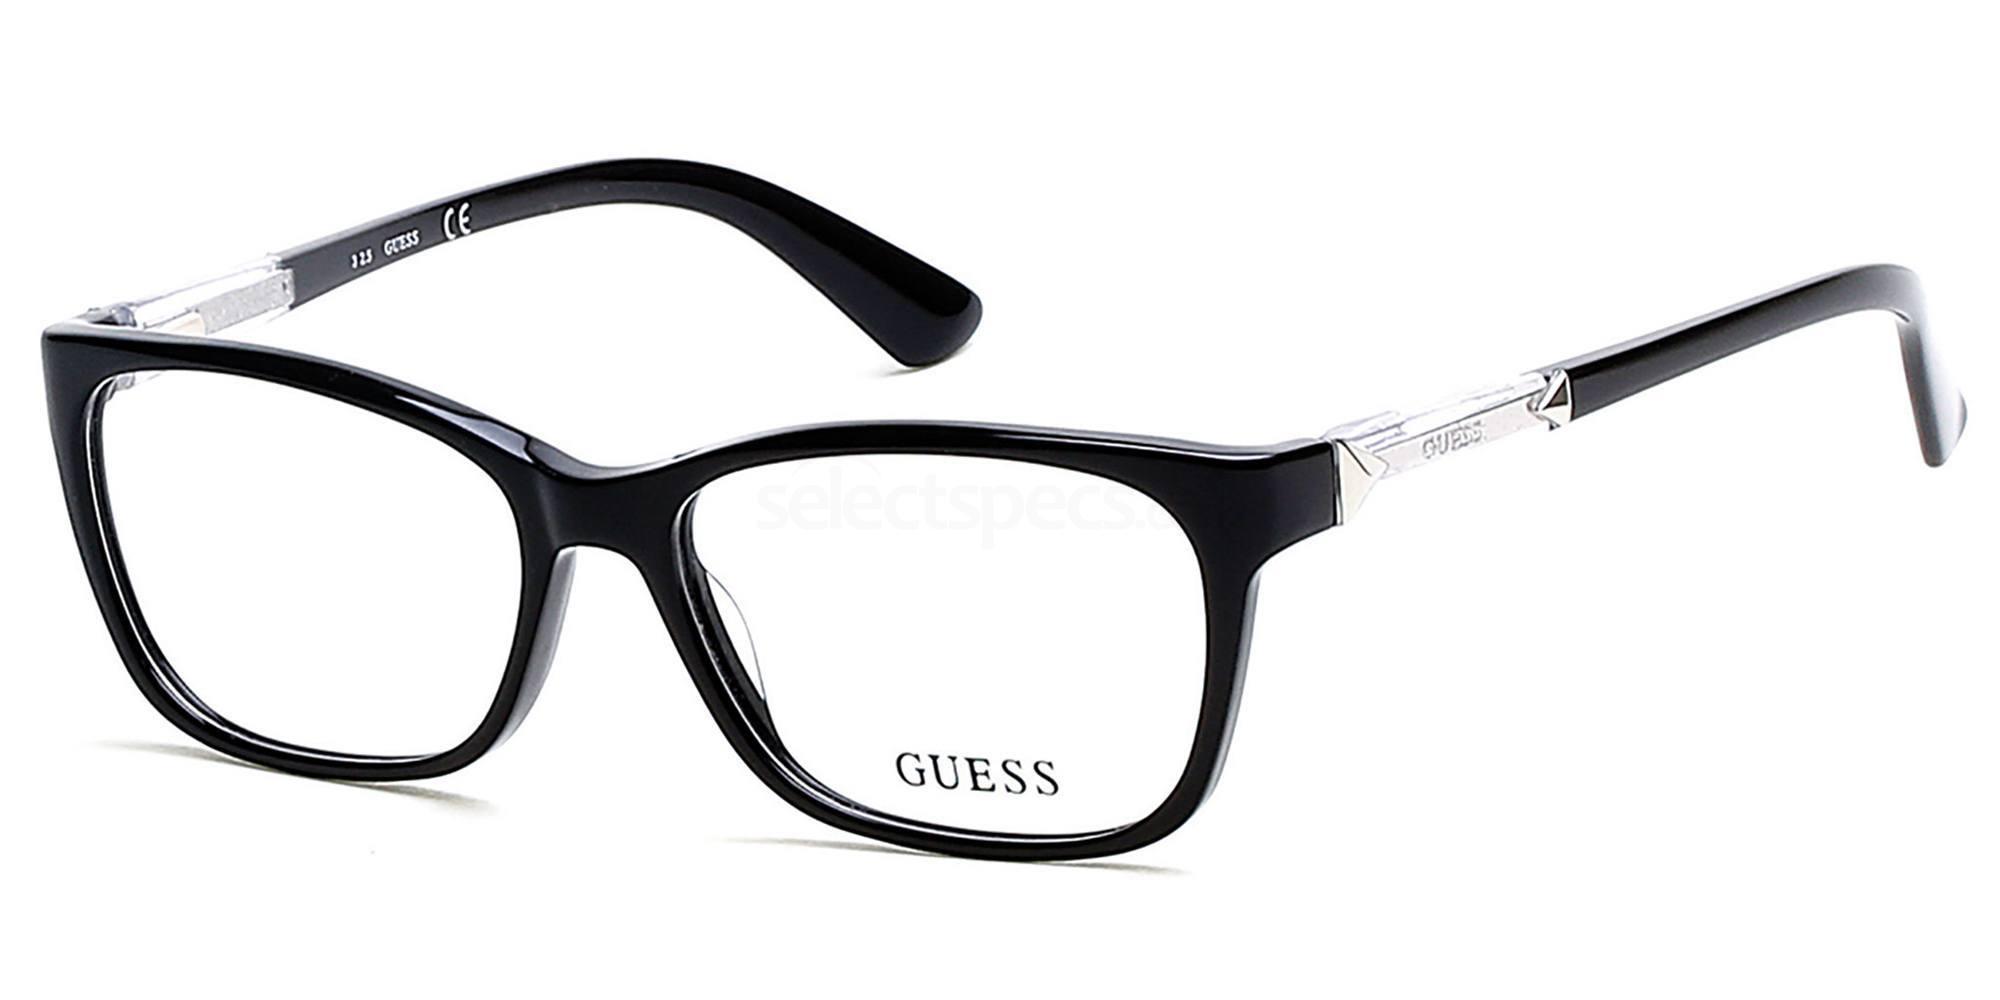 001 GU2561 Glasses, Guess